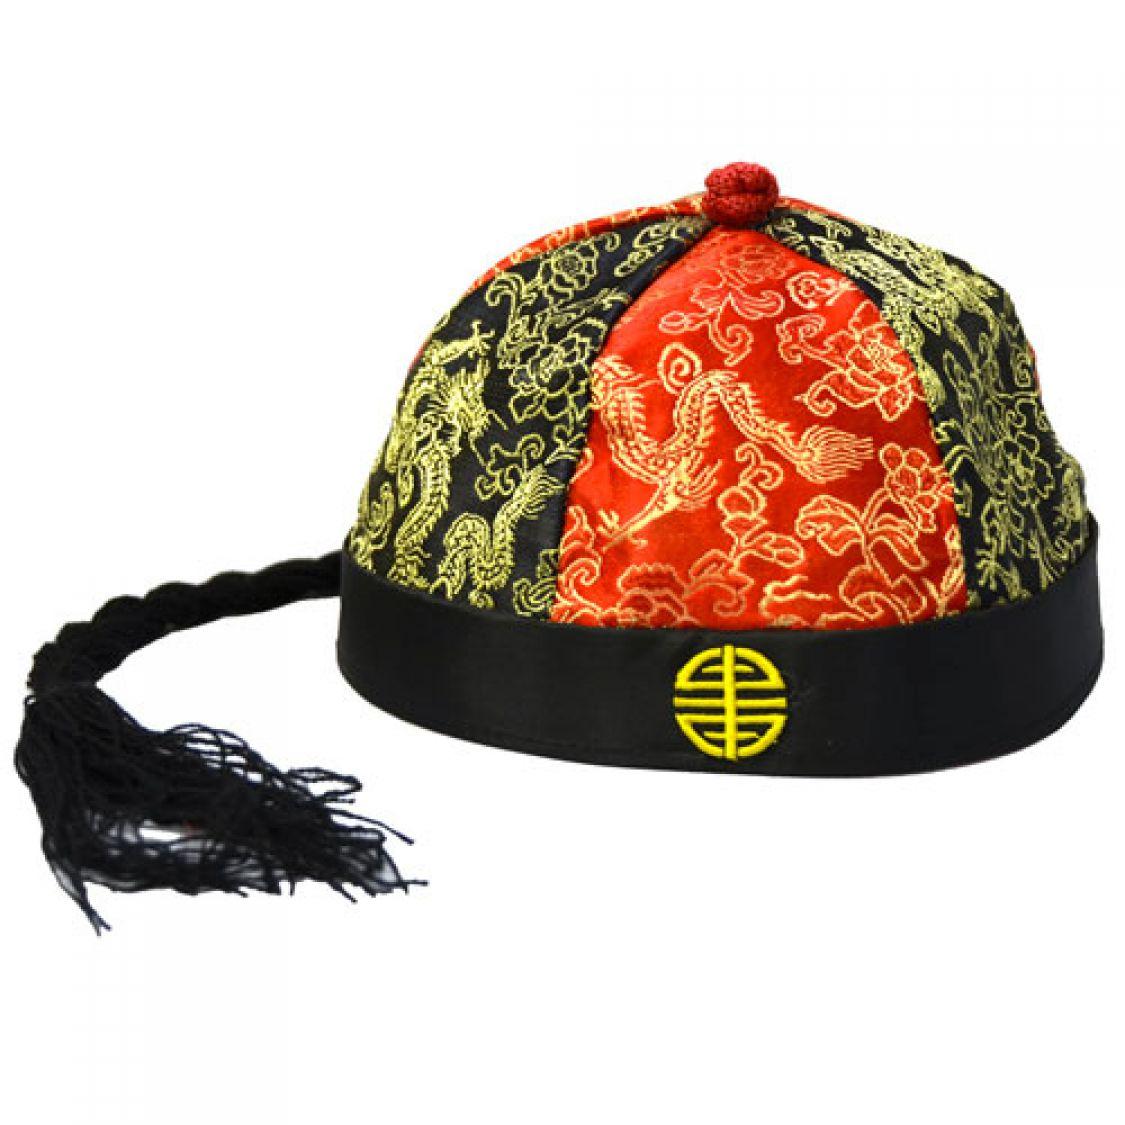 Chapeau Mandarin Tissu tout Chapeau Chinois Cheminée